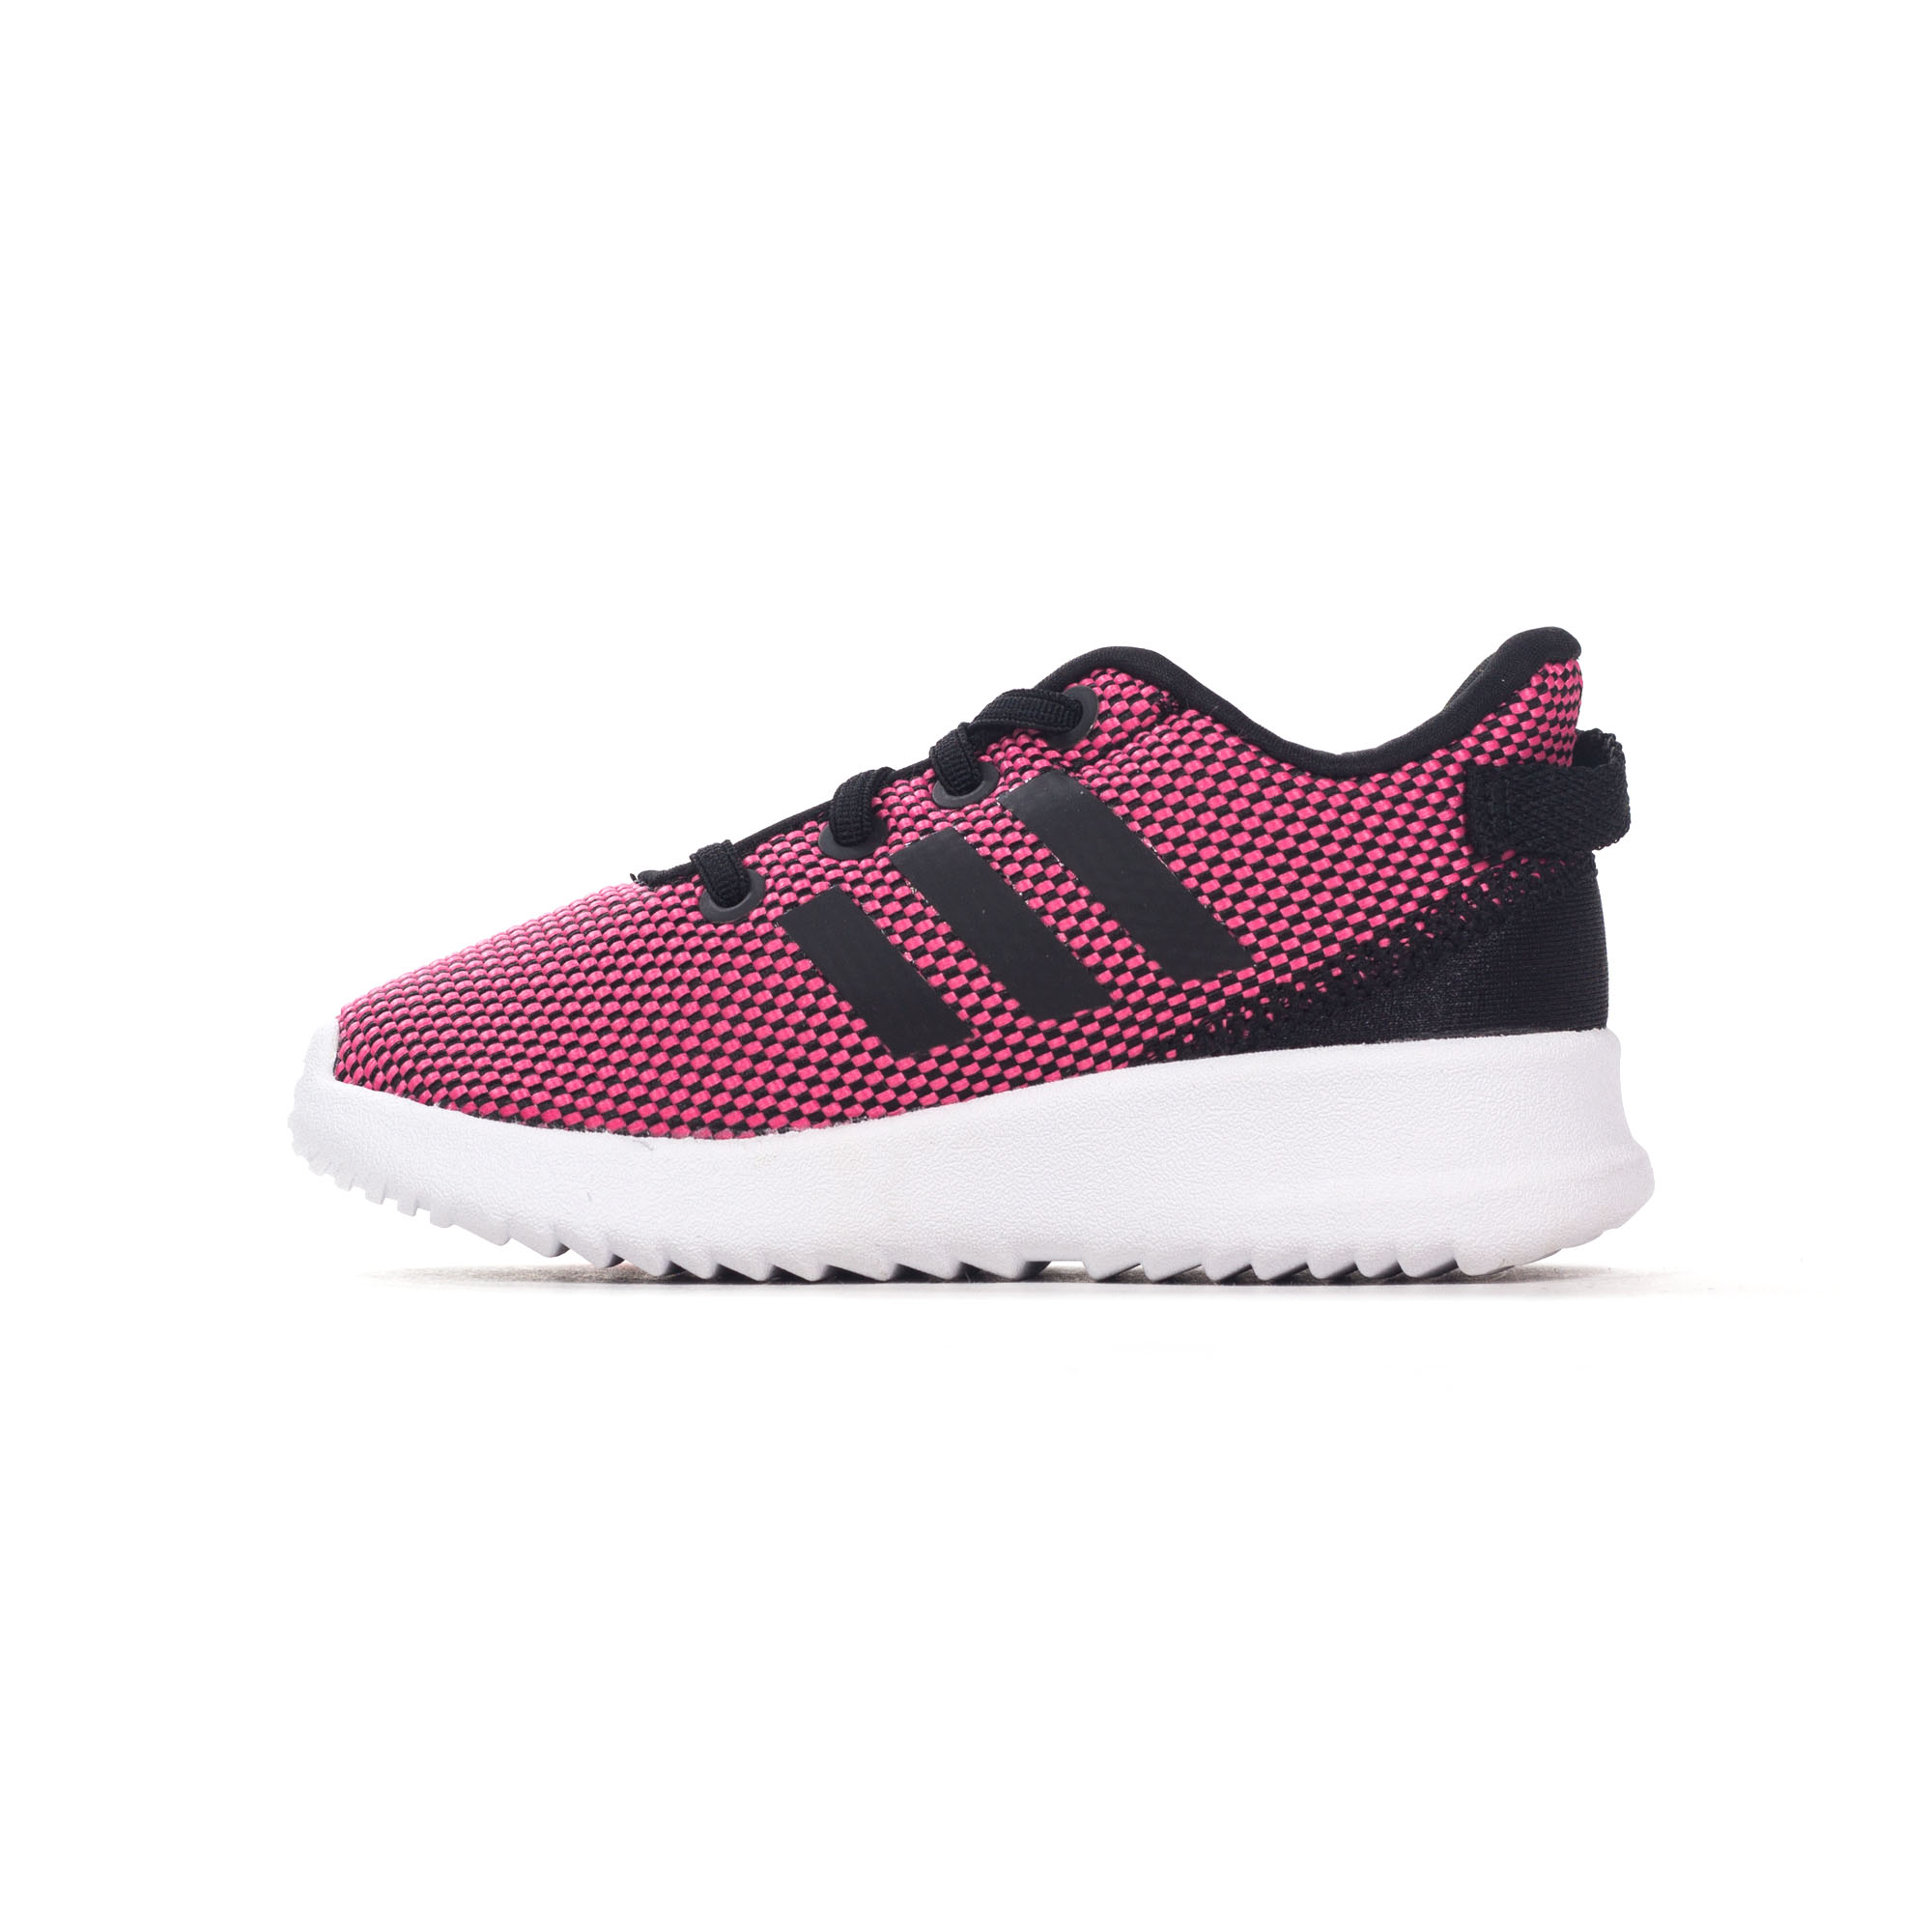 3f89f1d44ba3e Adidas NEO Racer TR enfant Kids filles Sports Trainer chaussure rose blanc